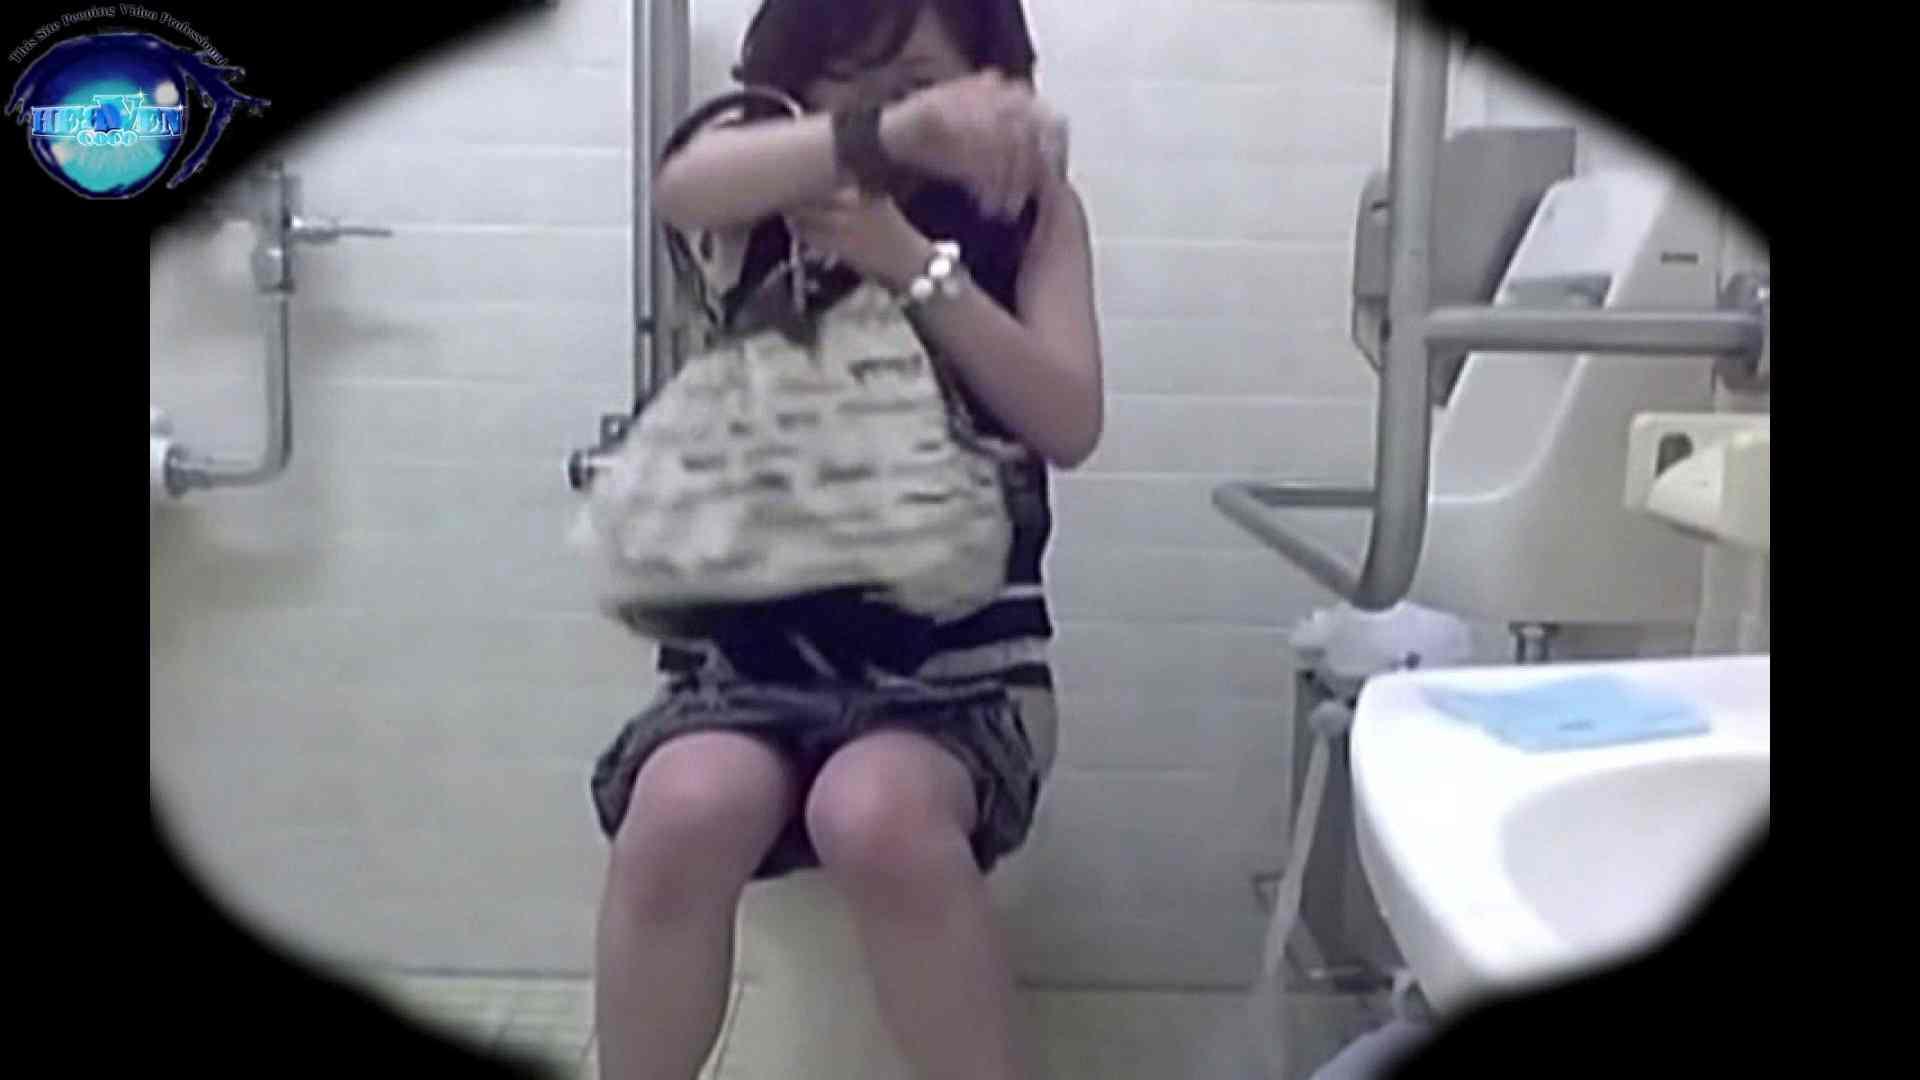 teen galトイレ覗き紙がナイ編‼vol.16 OLのエロ生活 セックス無修正動画無料 26連発 22